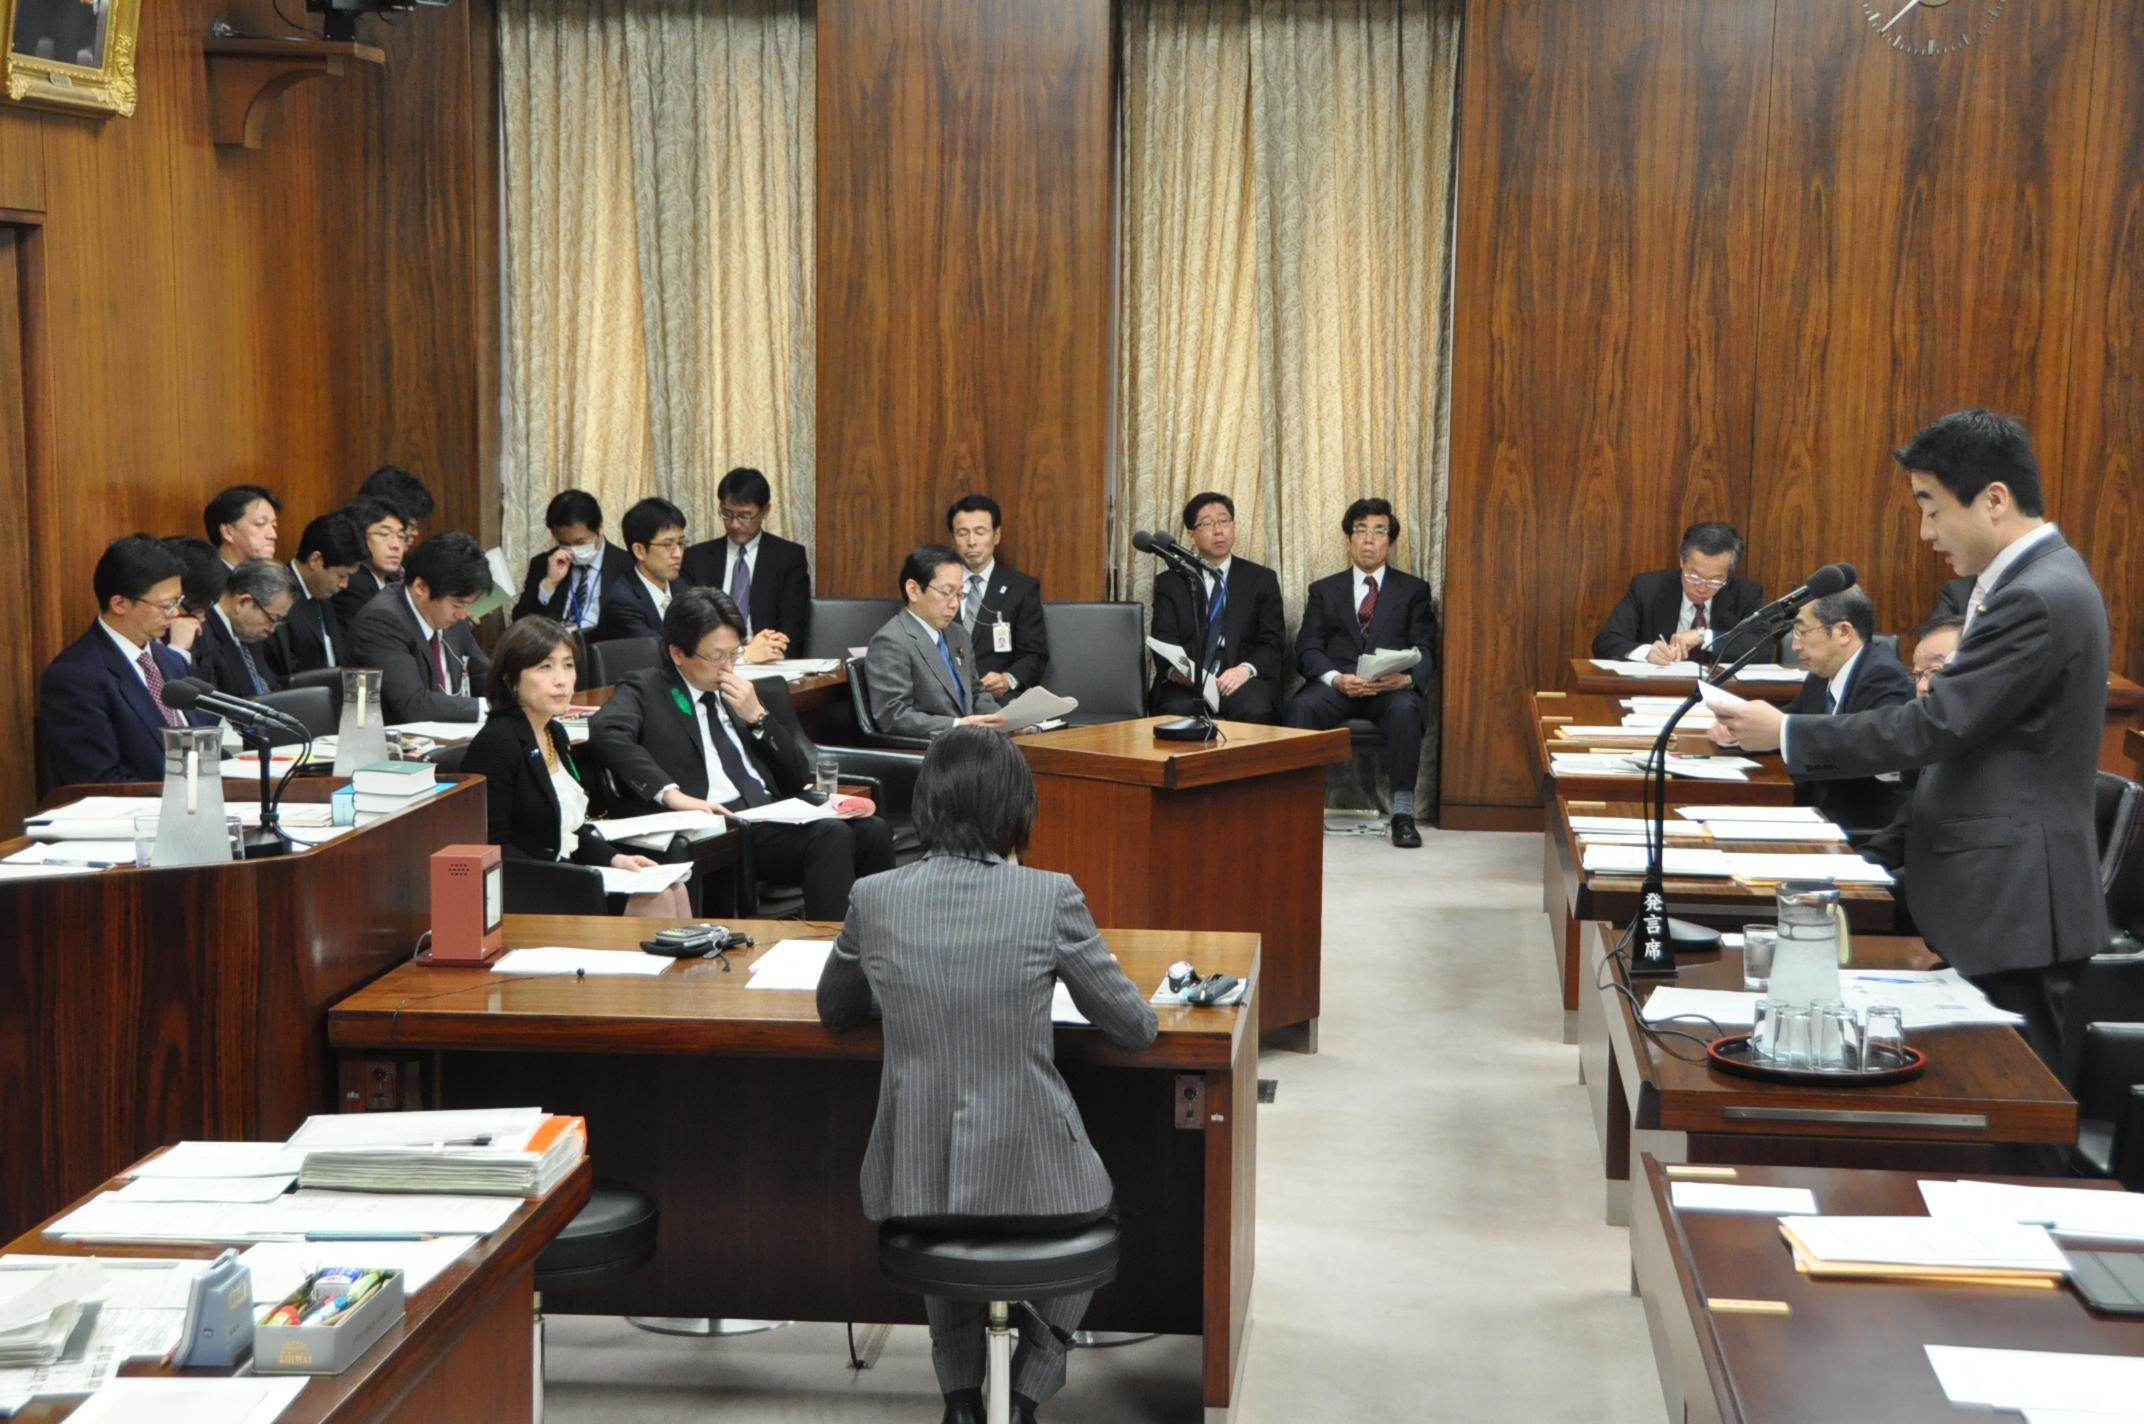 20130419経済産業委員会_消費税転嫁に関する特別措置法案の質疑_発質問14